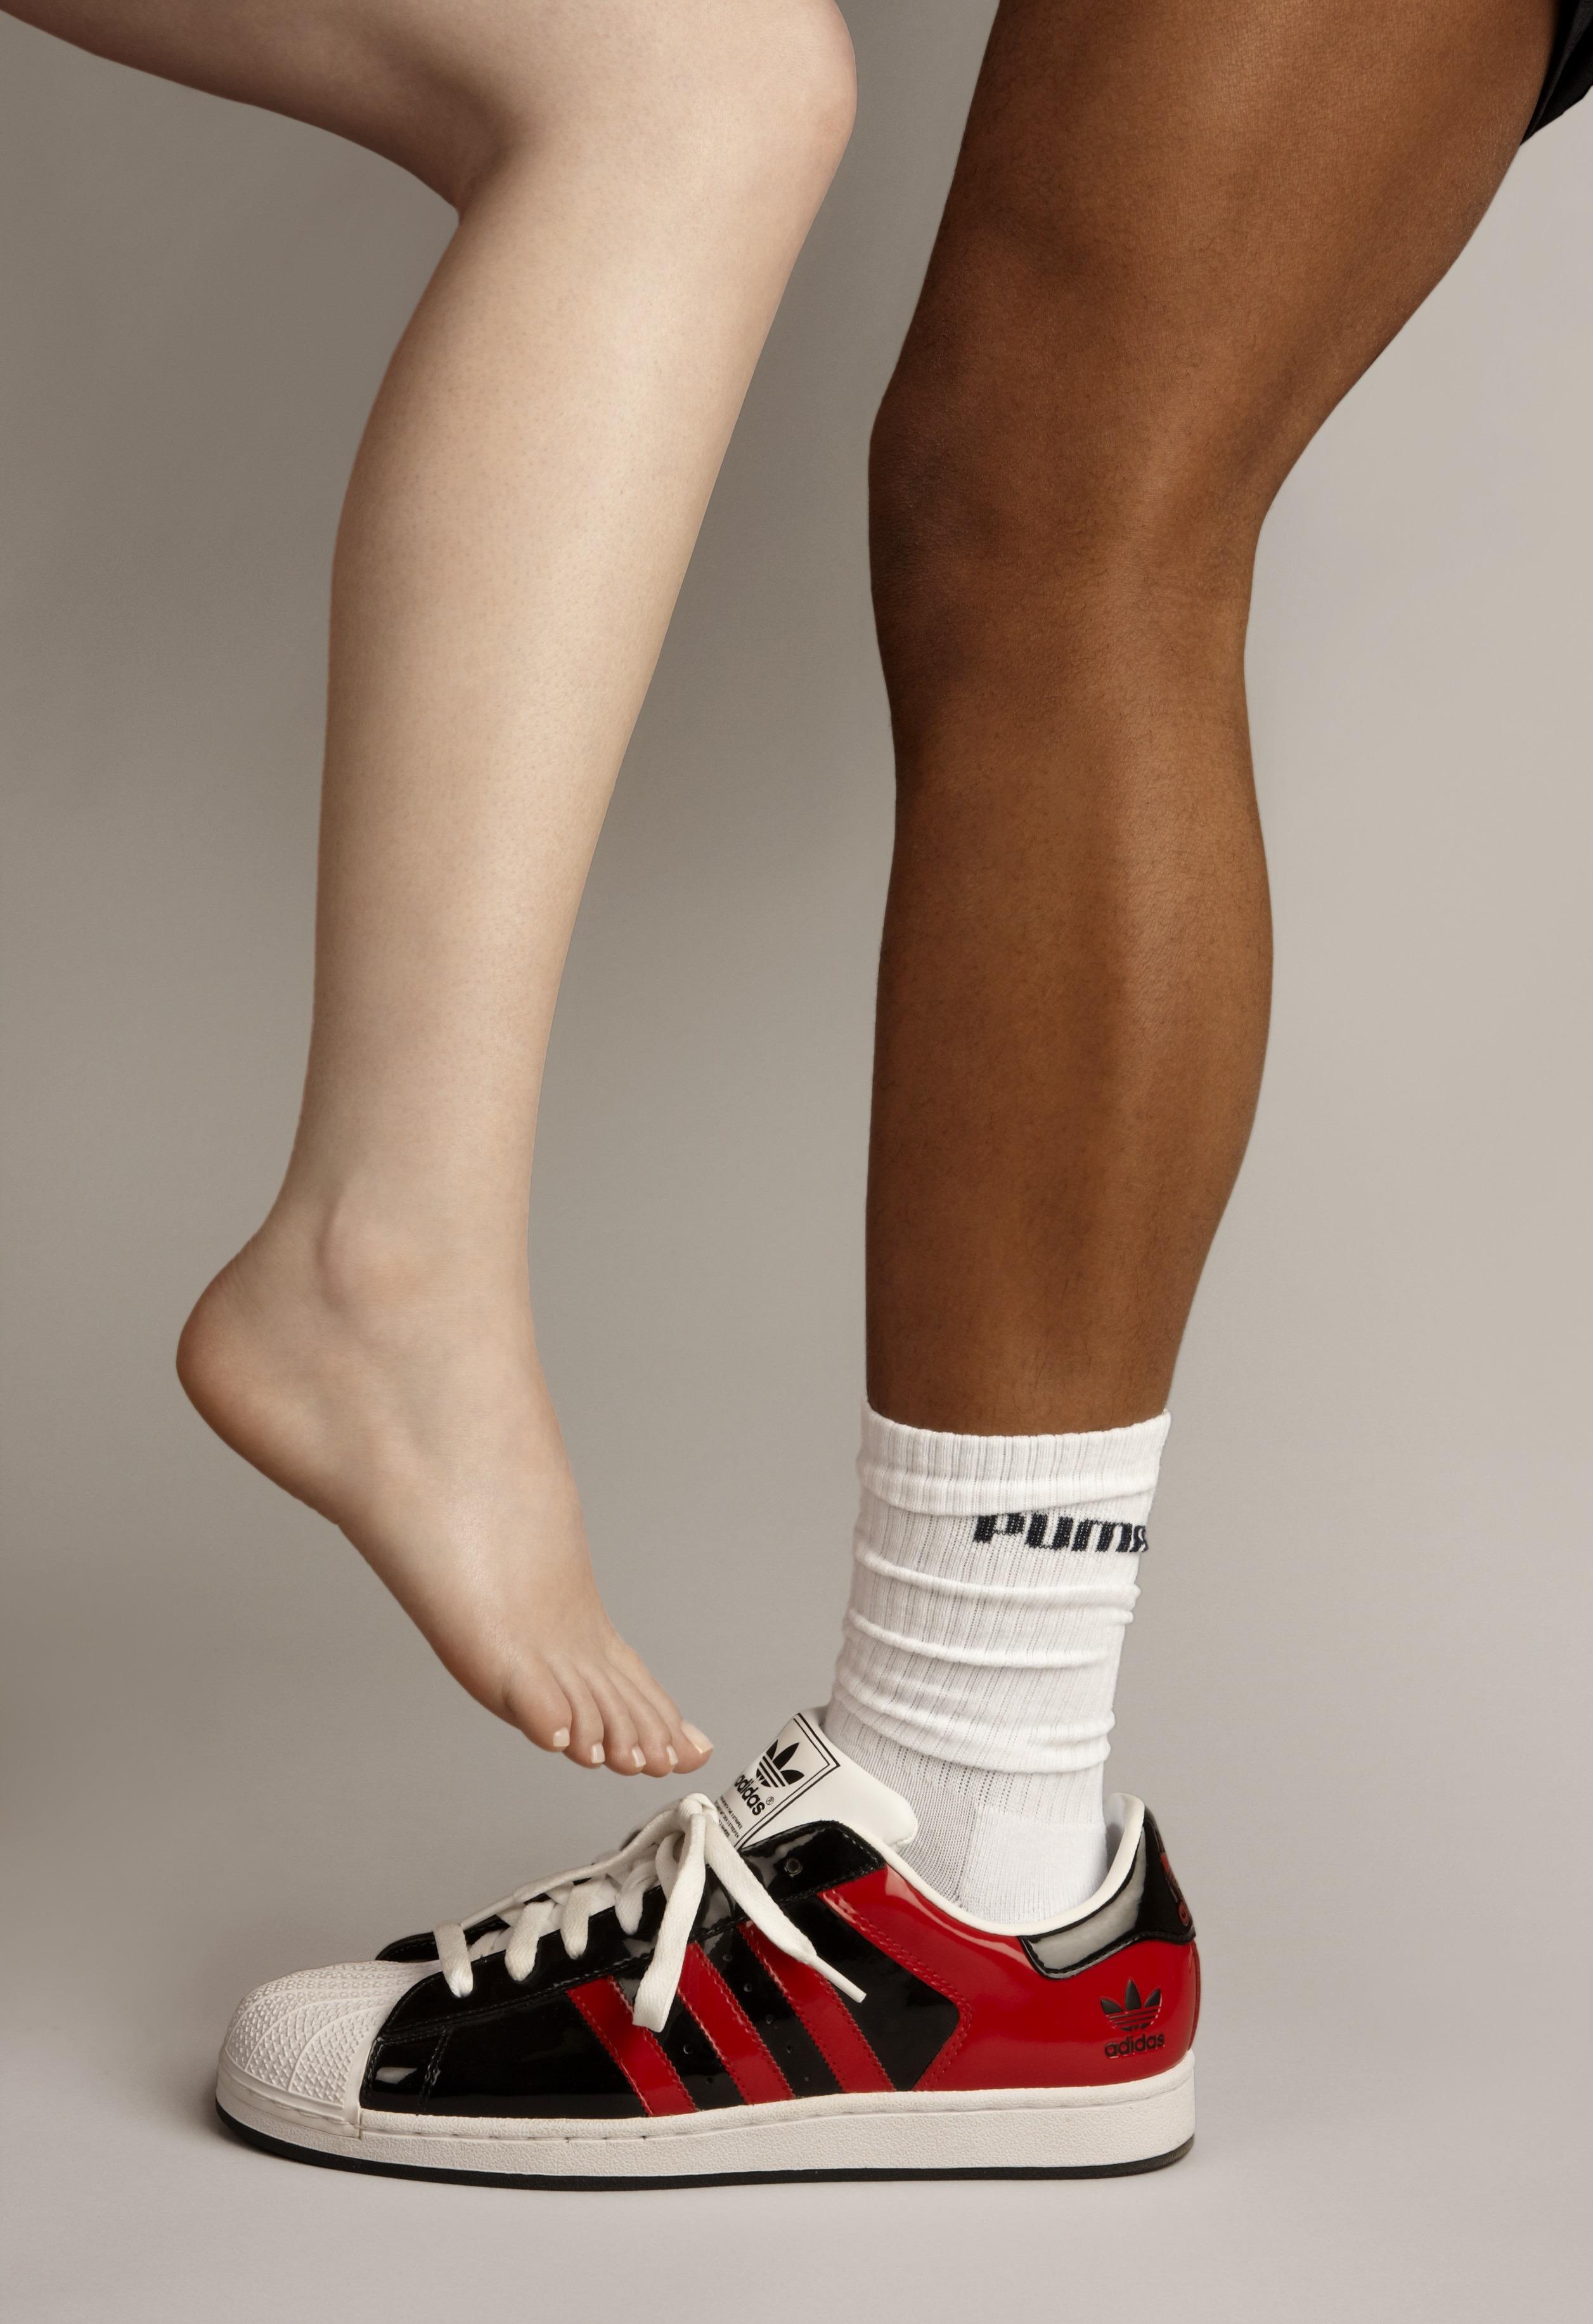 Christie_Feet1